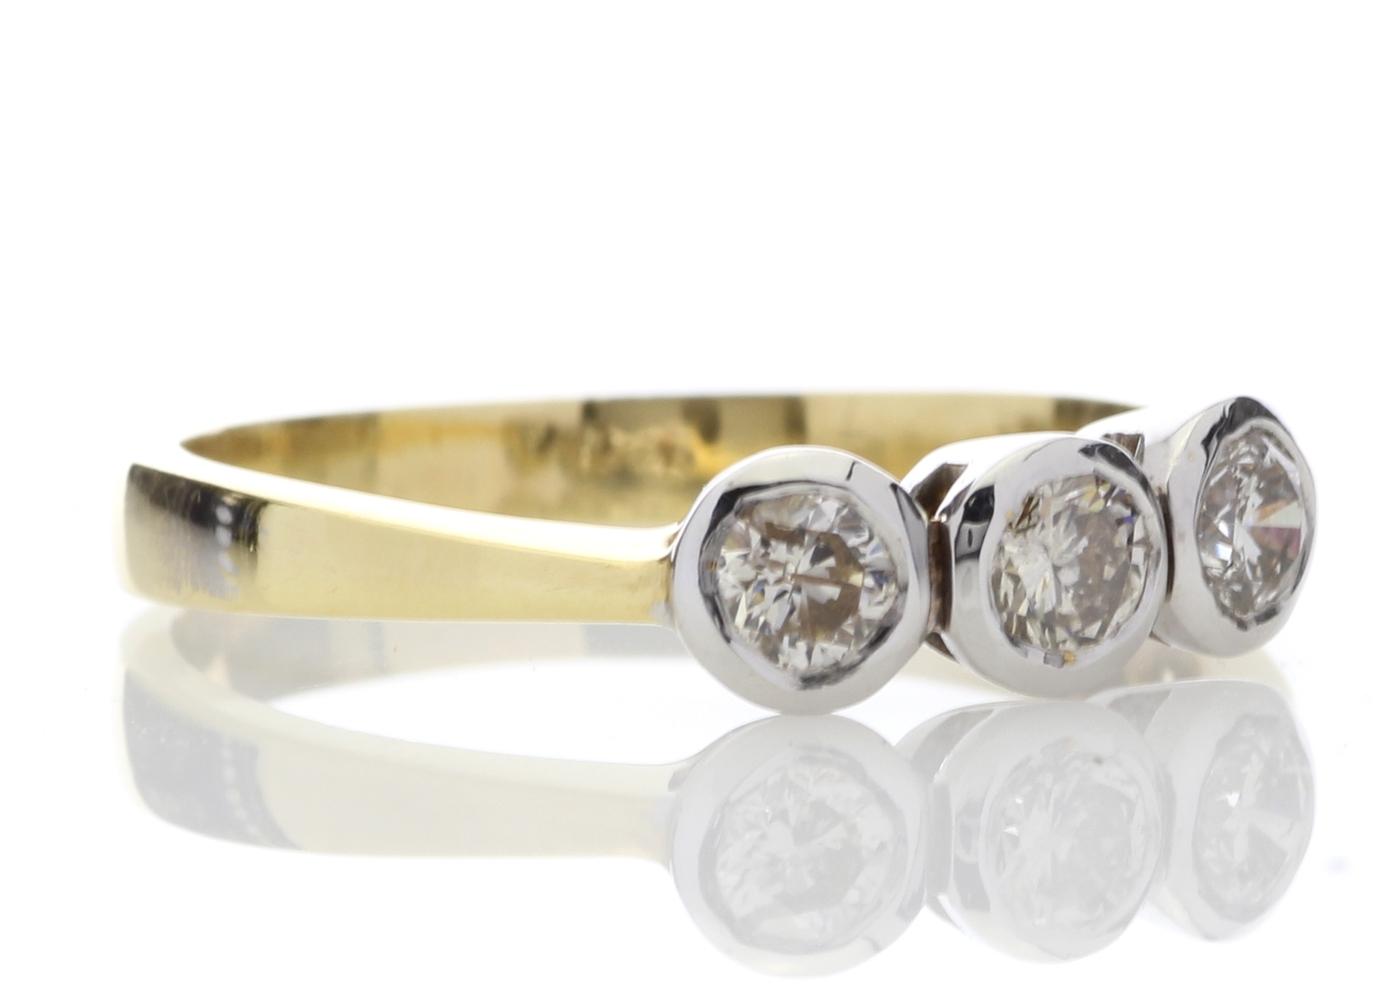 Lot 4 - 18ct Three Stone Claw Set Diamond Ring 0.75 Carats